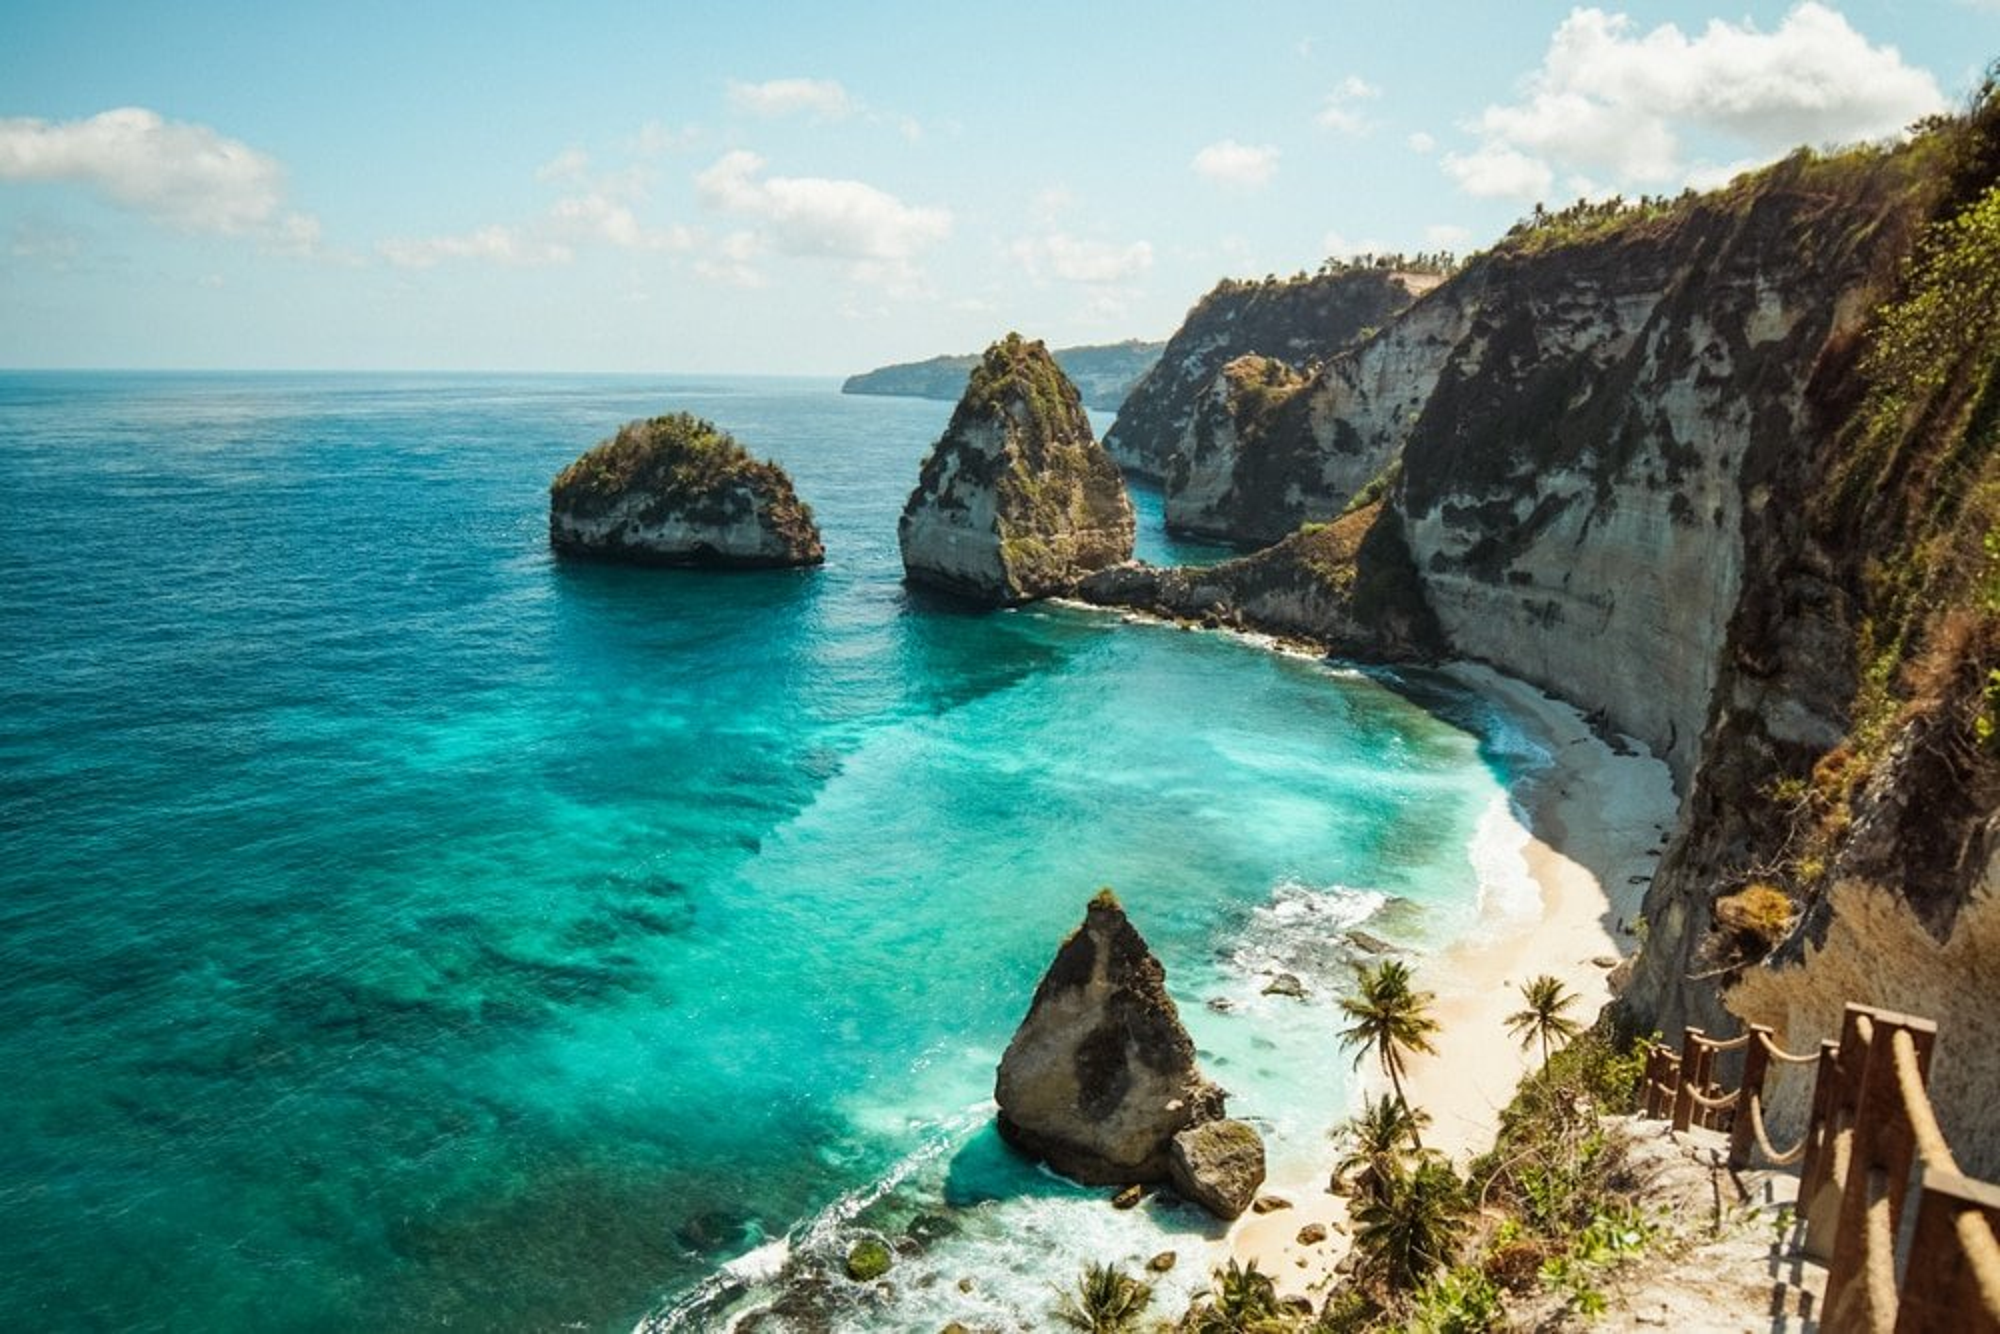 La belle plage de diamants de Nusa Penida, Bali, Indonésie